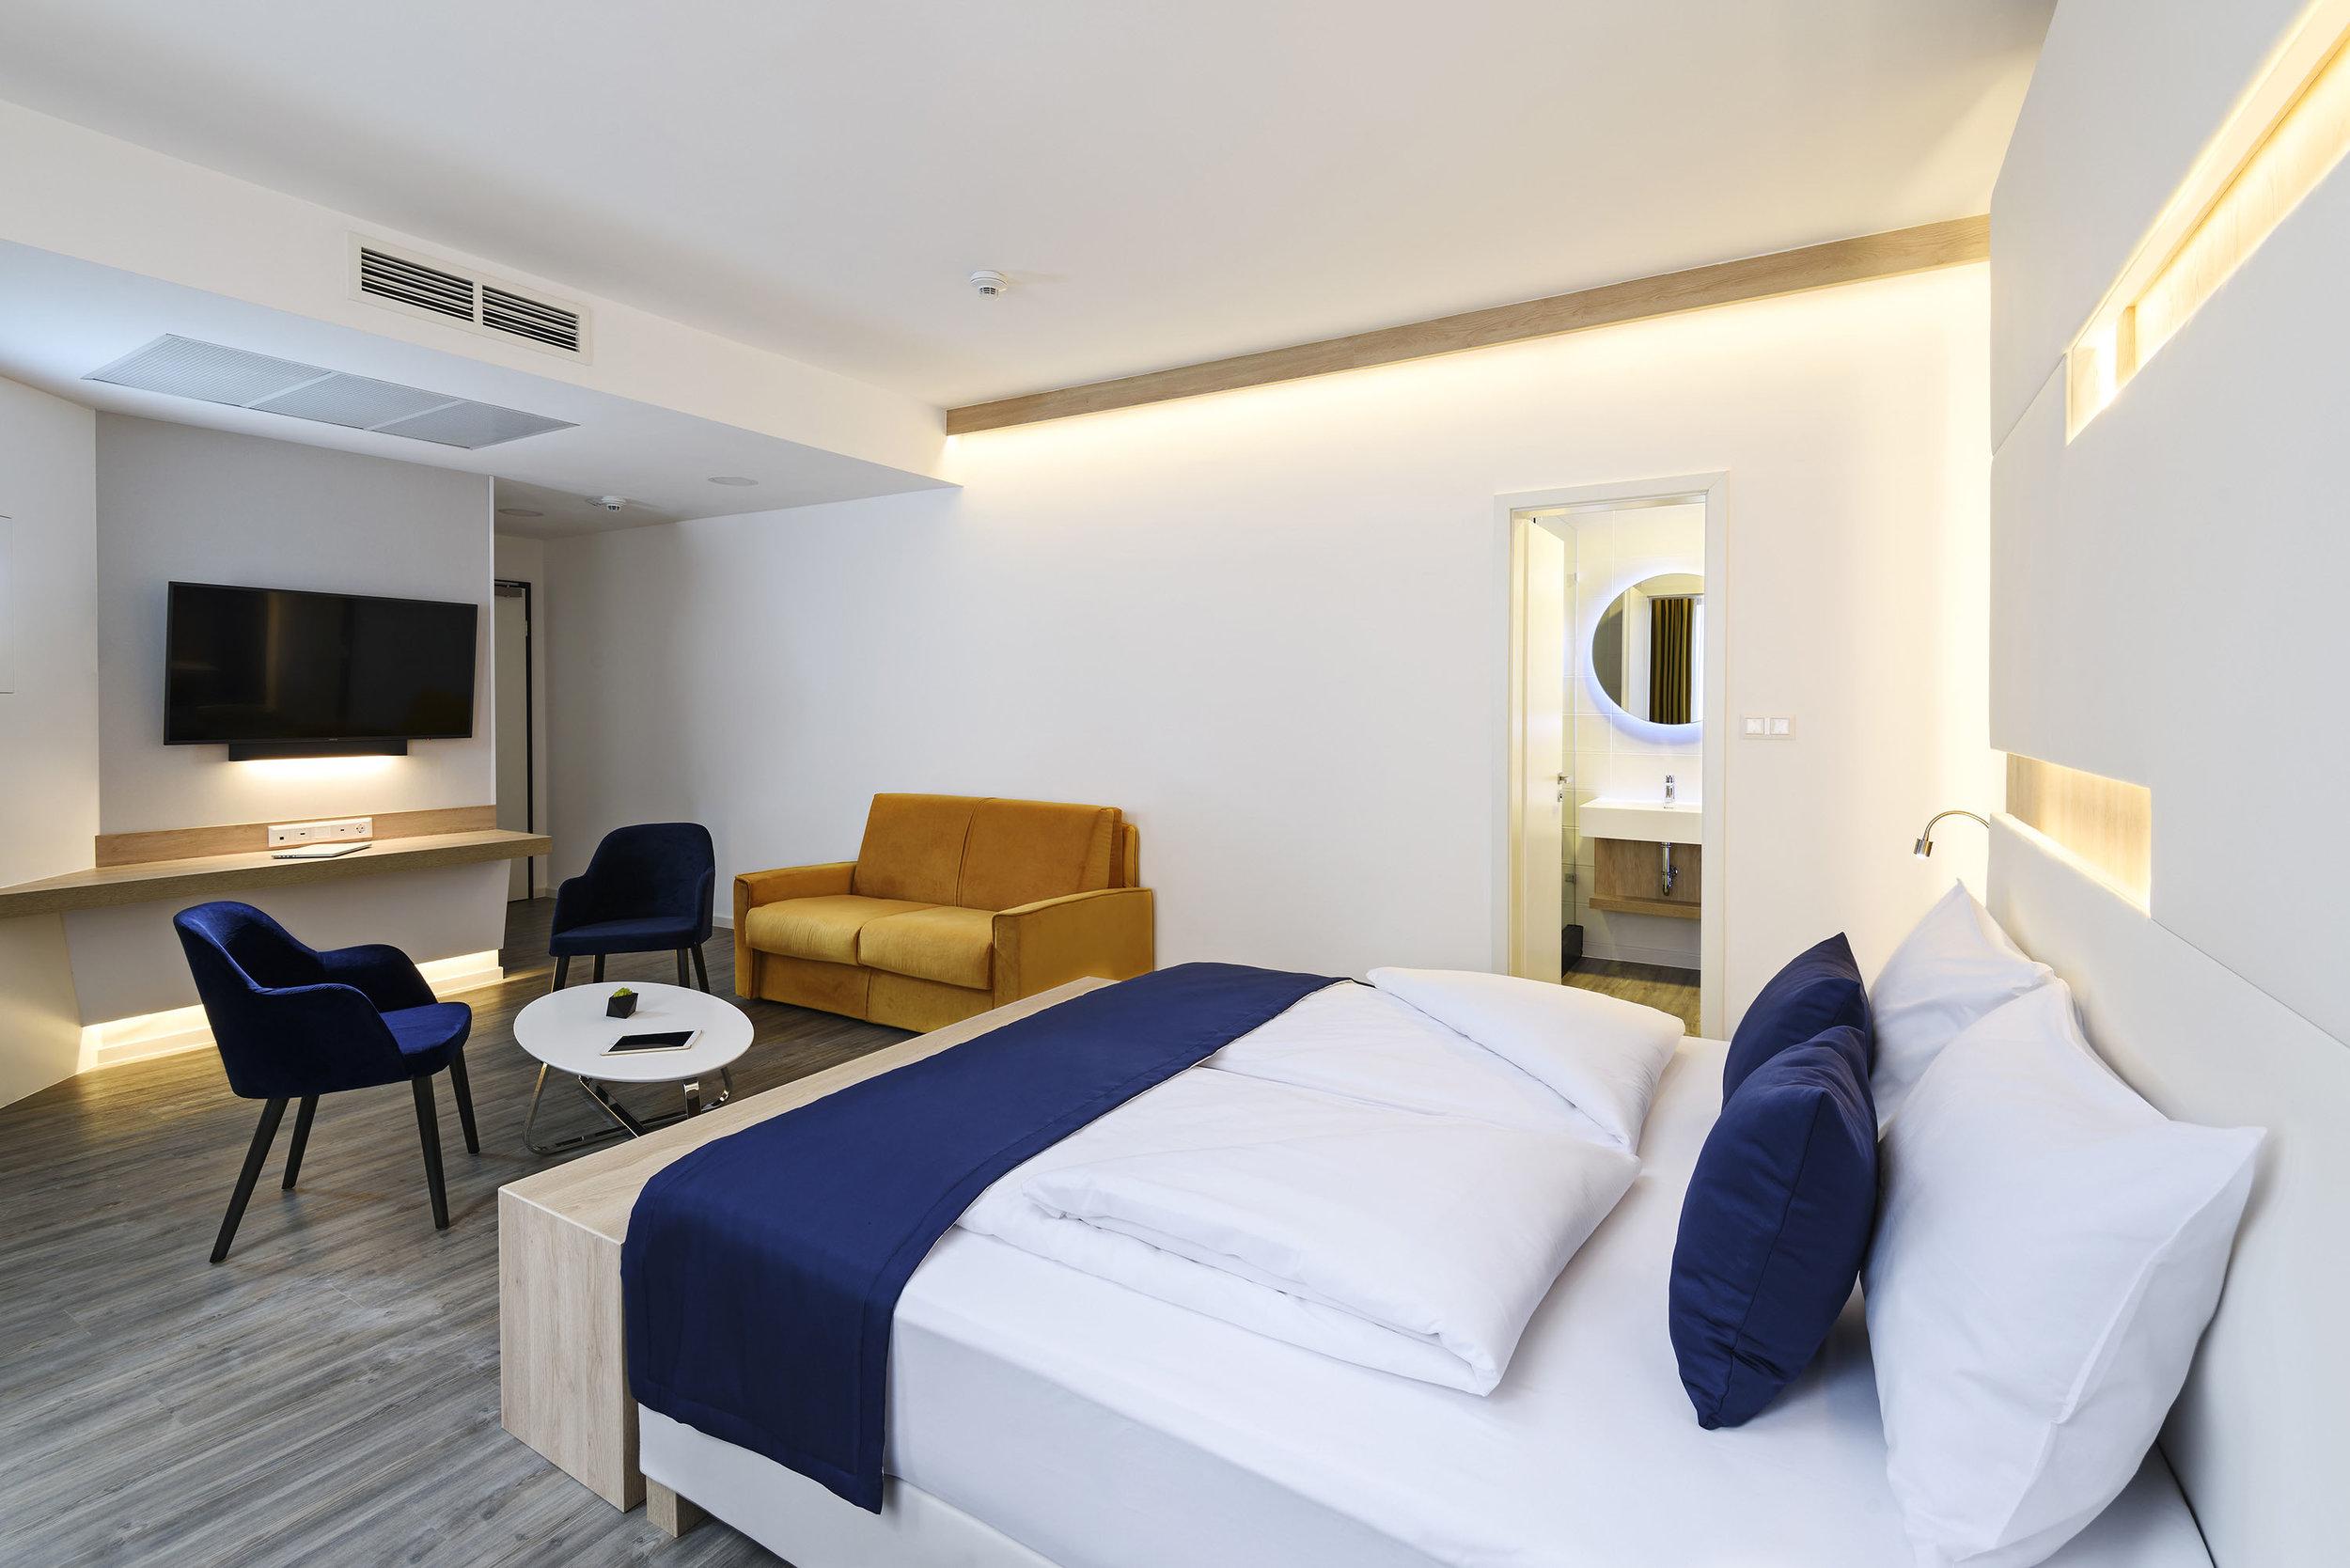 KVI_Hotel_305_01_mod.jpg